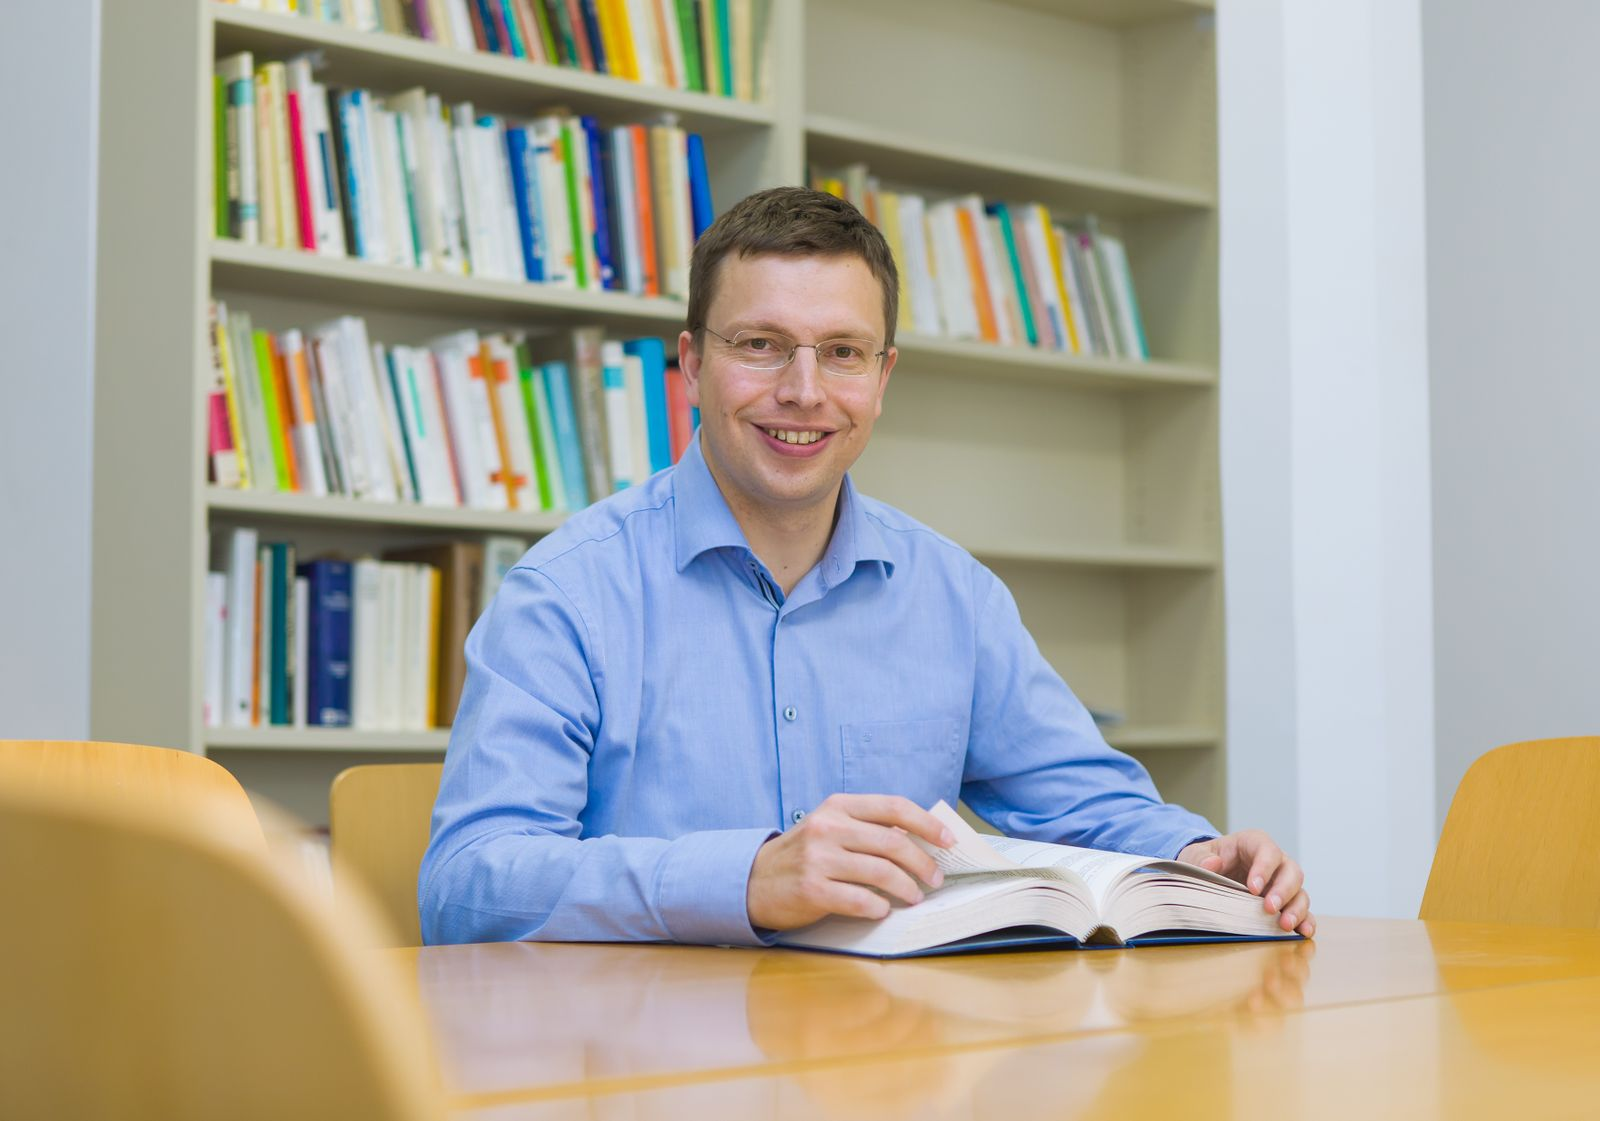 Prof. Dr. Hannes Zacher Professor of Work and Organizational Psychology University of Leipzig | Institute of Psychology